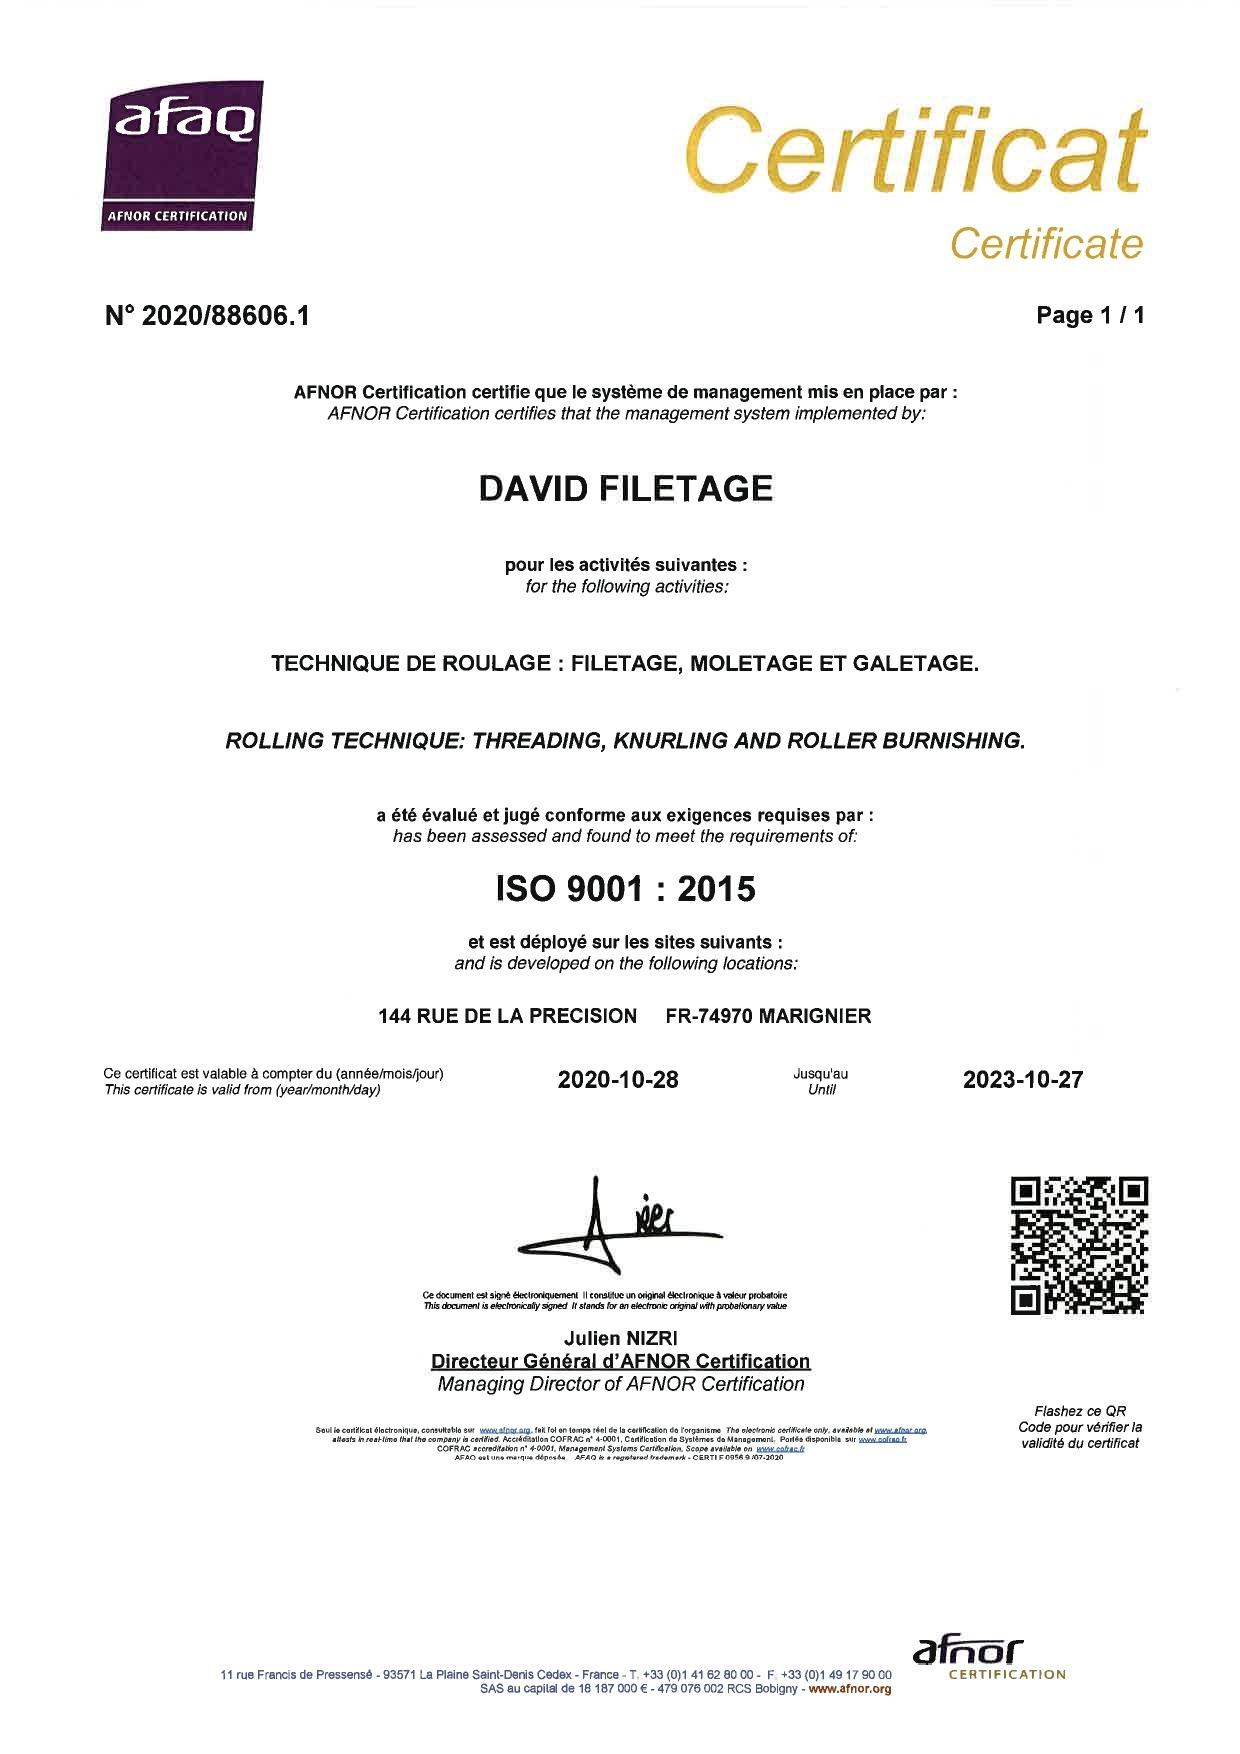 David Filetage - certification iso 9001